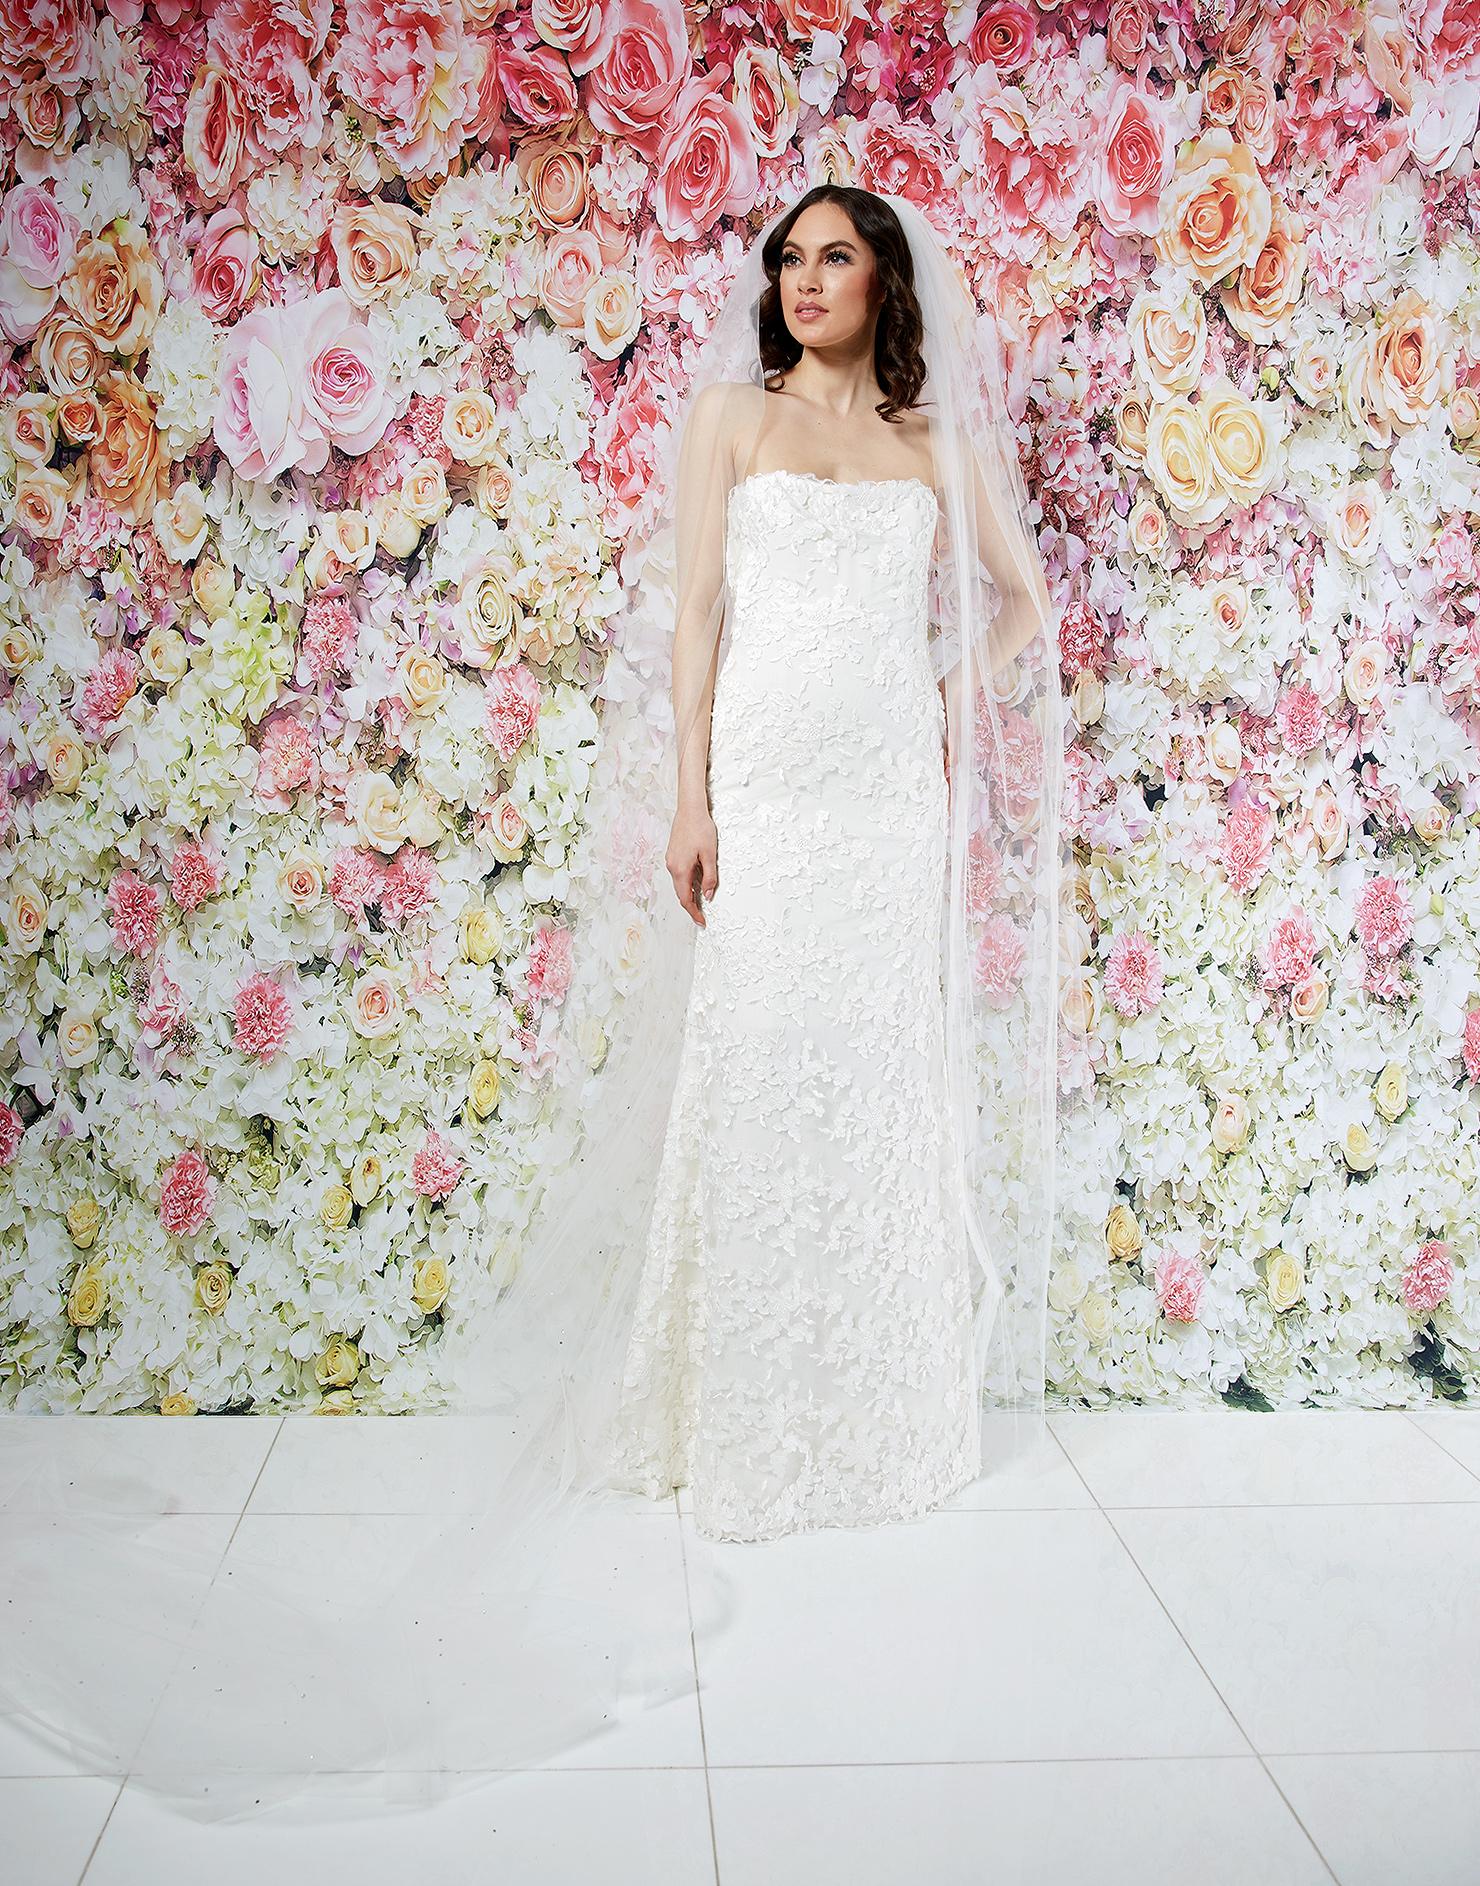 randi rahm wedding dress spring 2019 strapless floral applique